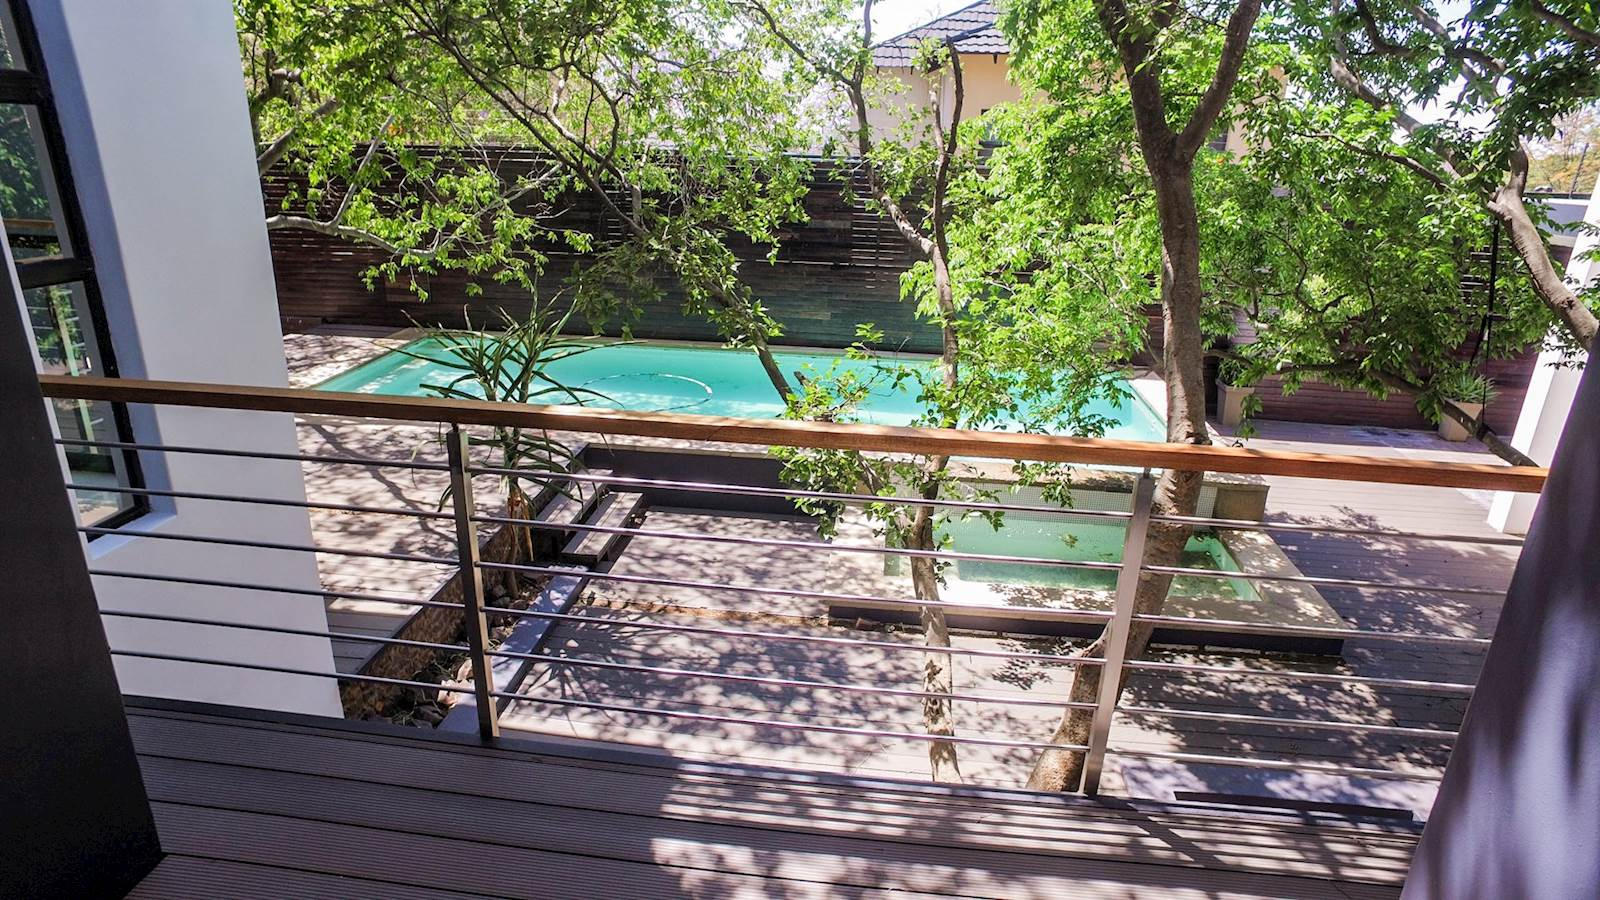 3 Bedroom House sold in Waterkloof Ridge ENT0010698 : photo#4